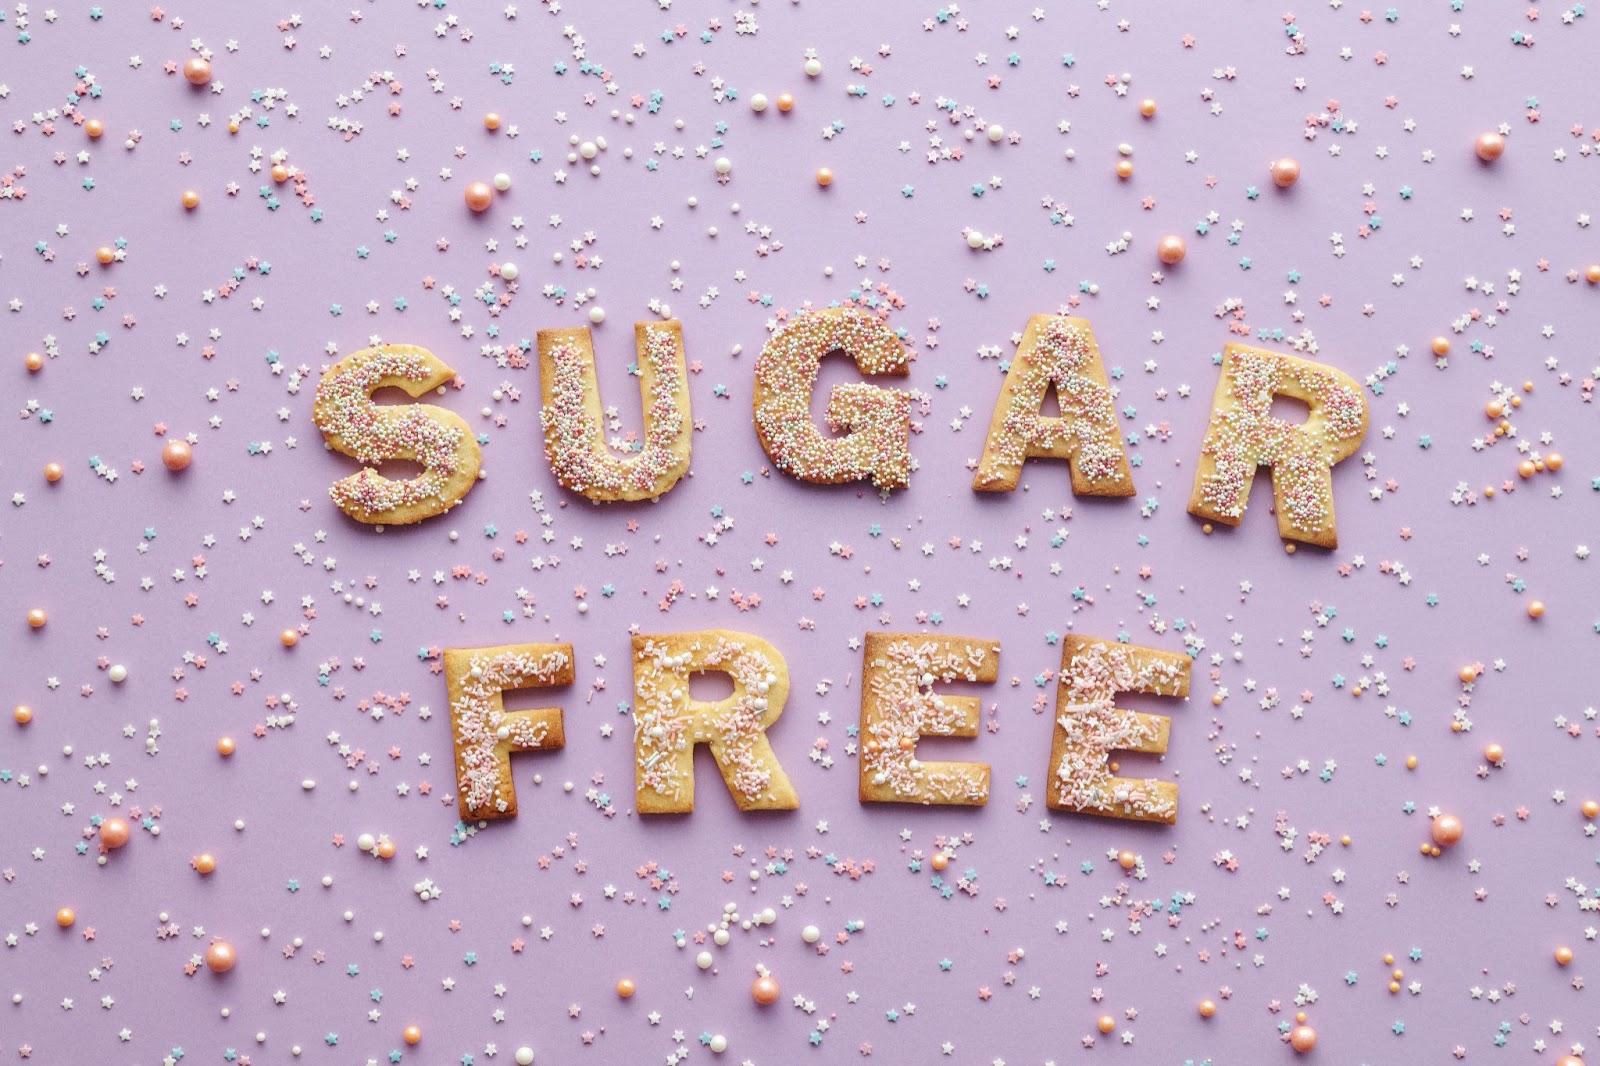 Should You Go on a No Sugar Diet?